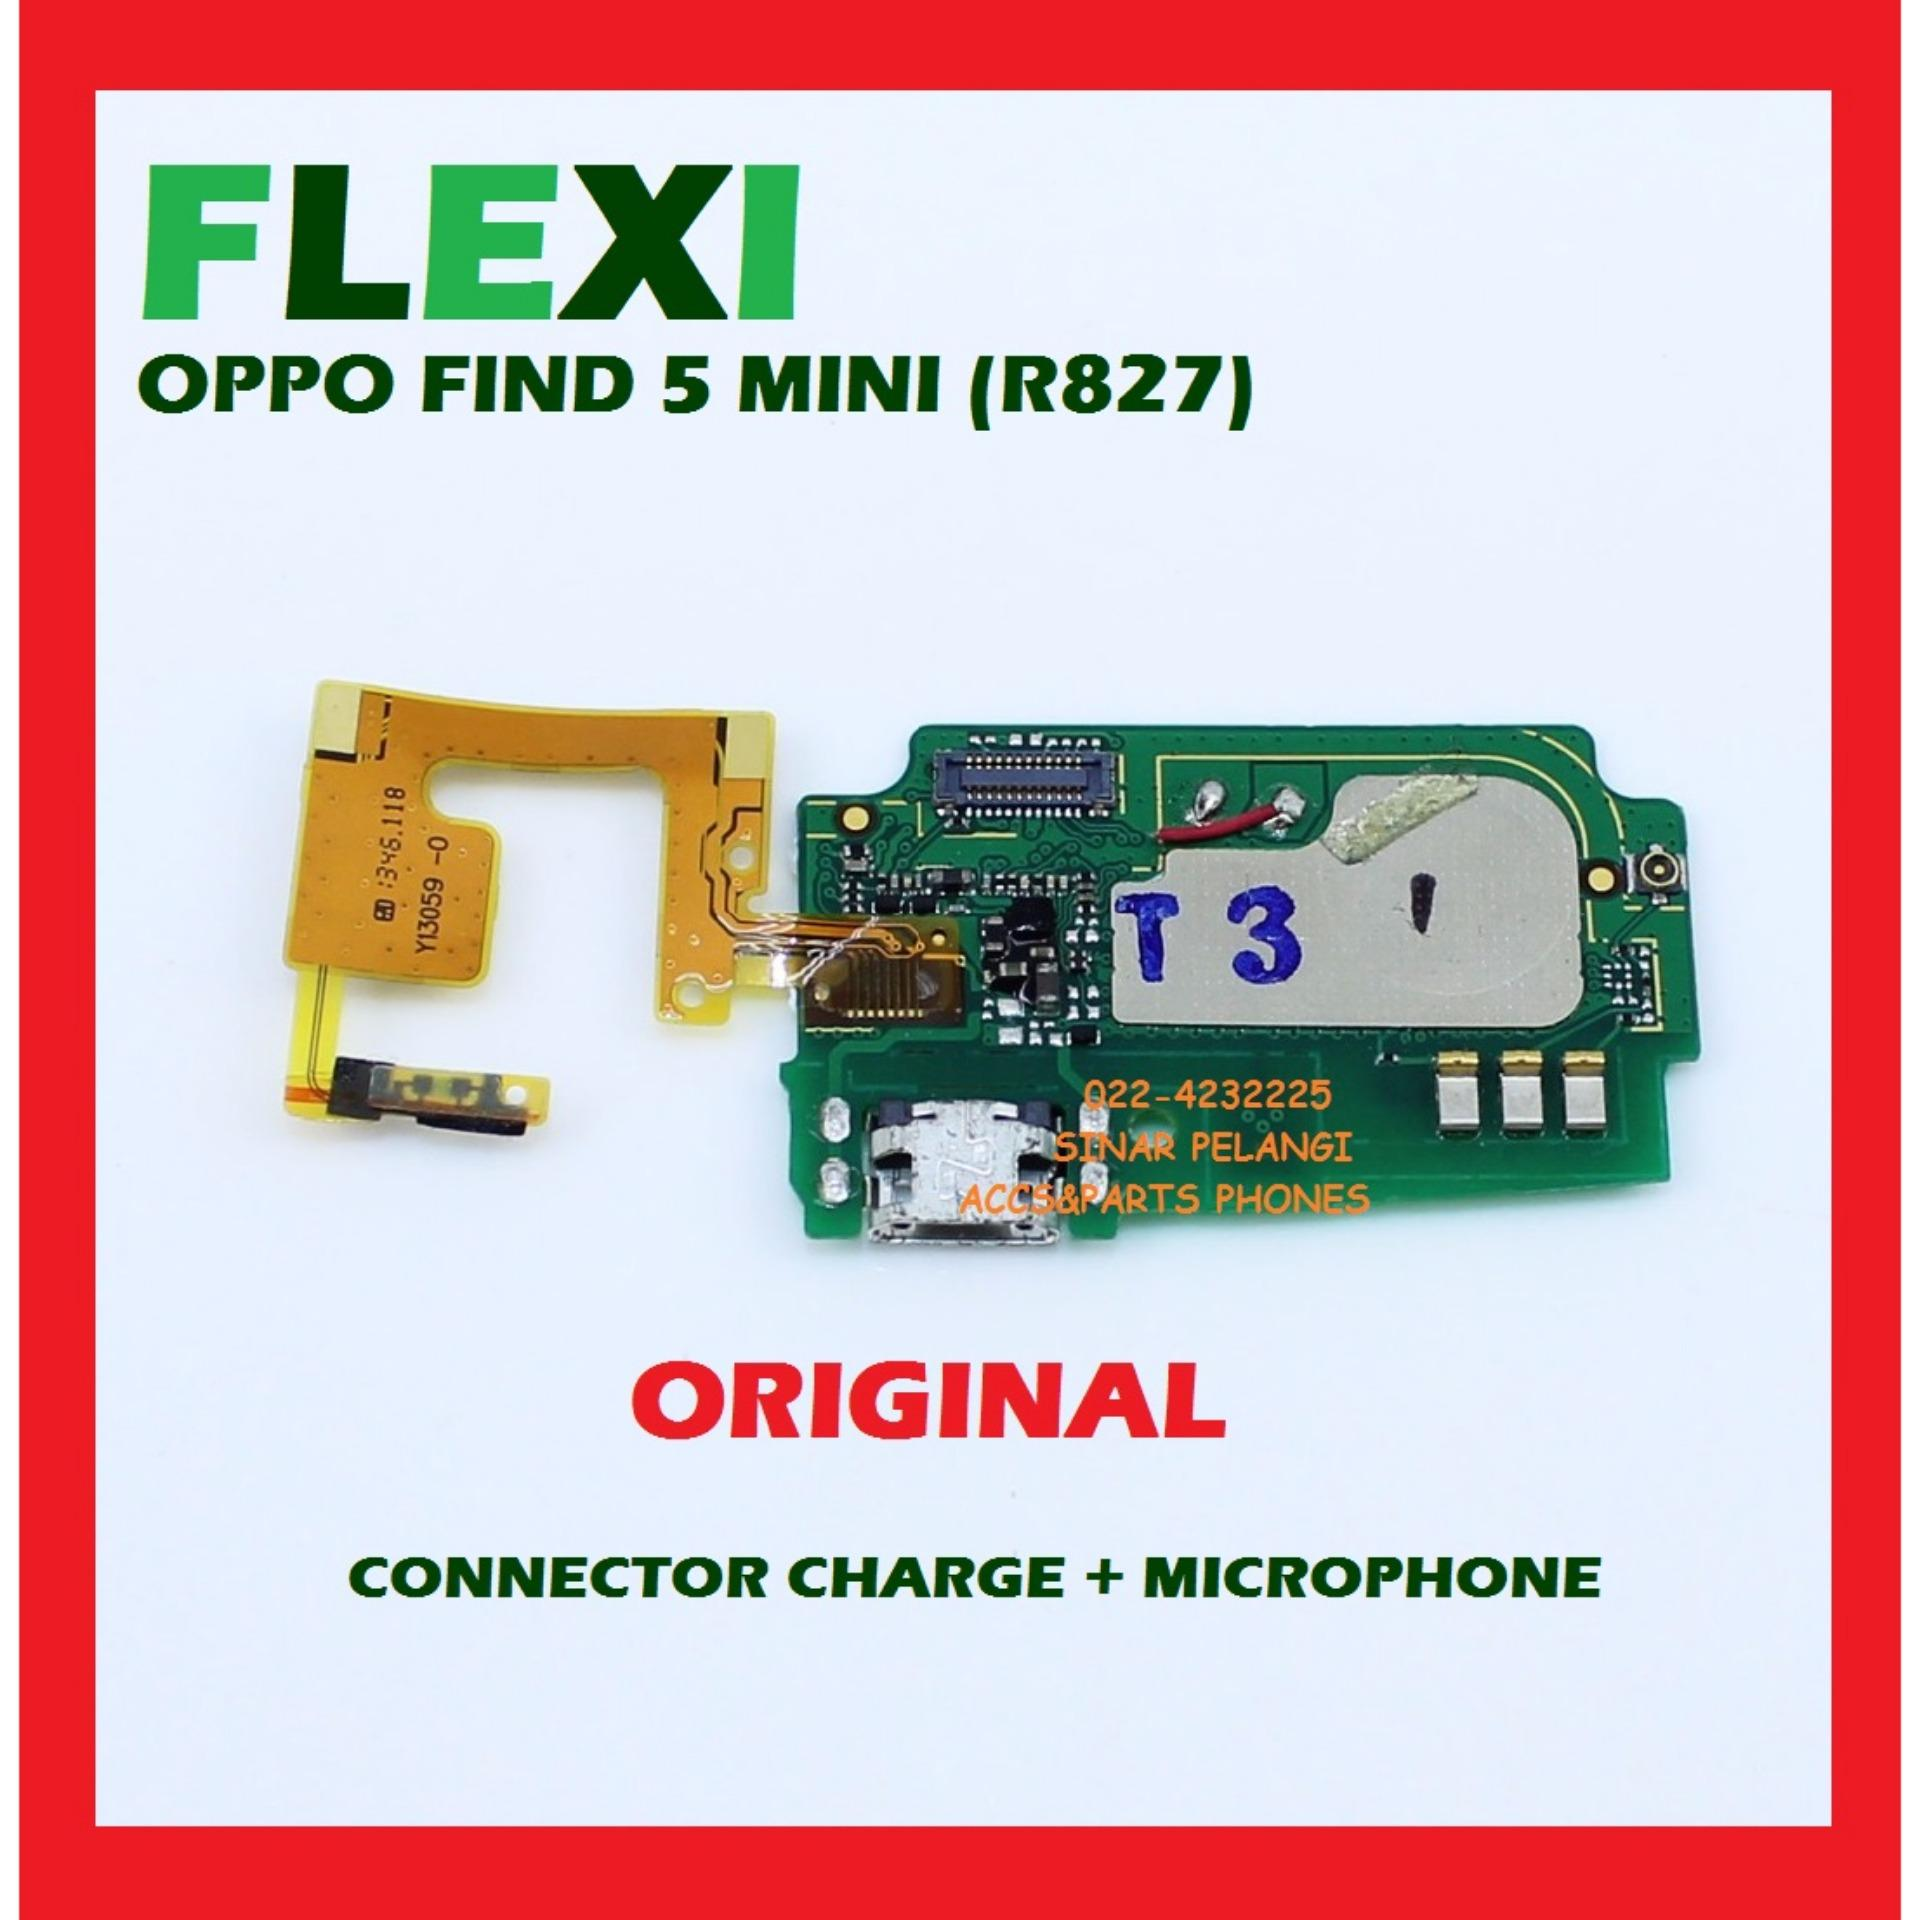 Fitur Oppo Neo Neo K Find Neo 3 R831 Flexi Flex Flexible Fleksibel